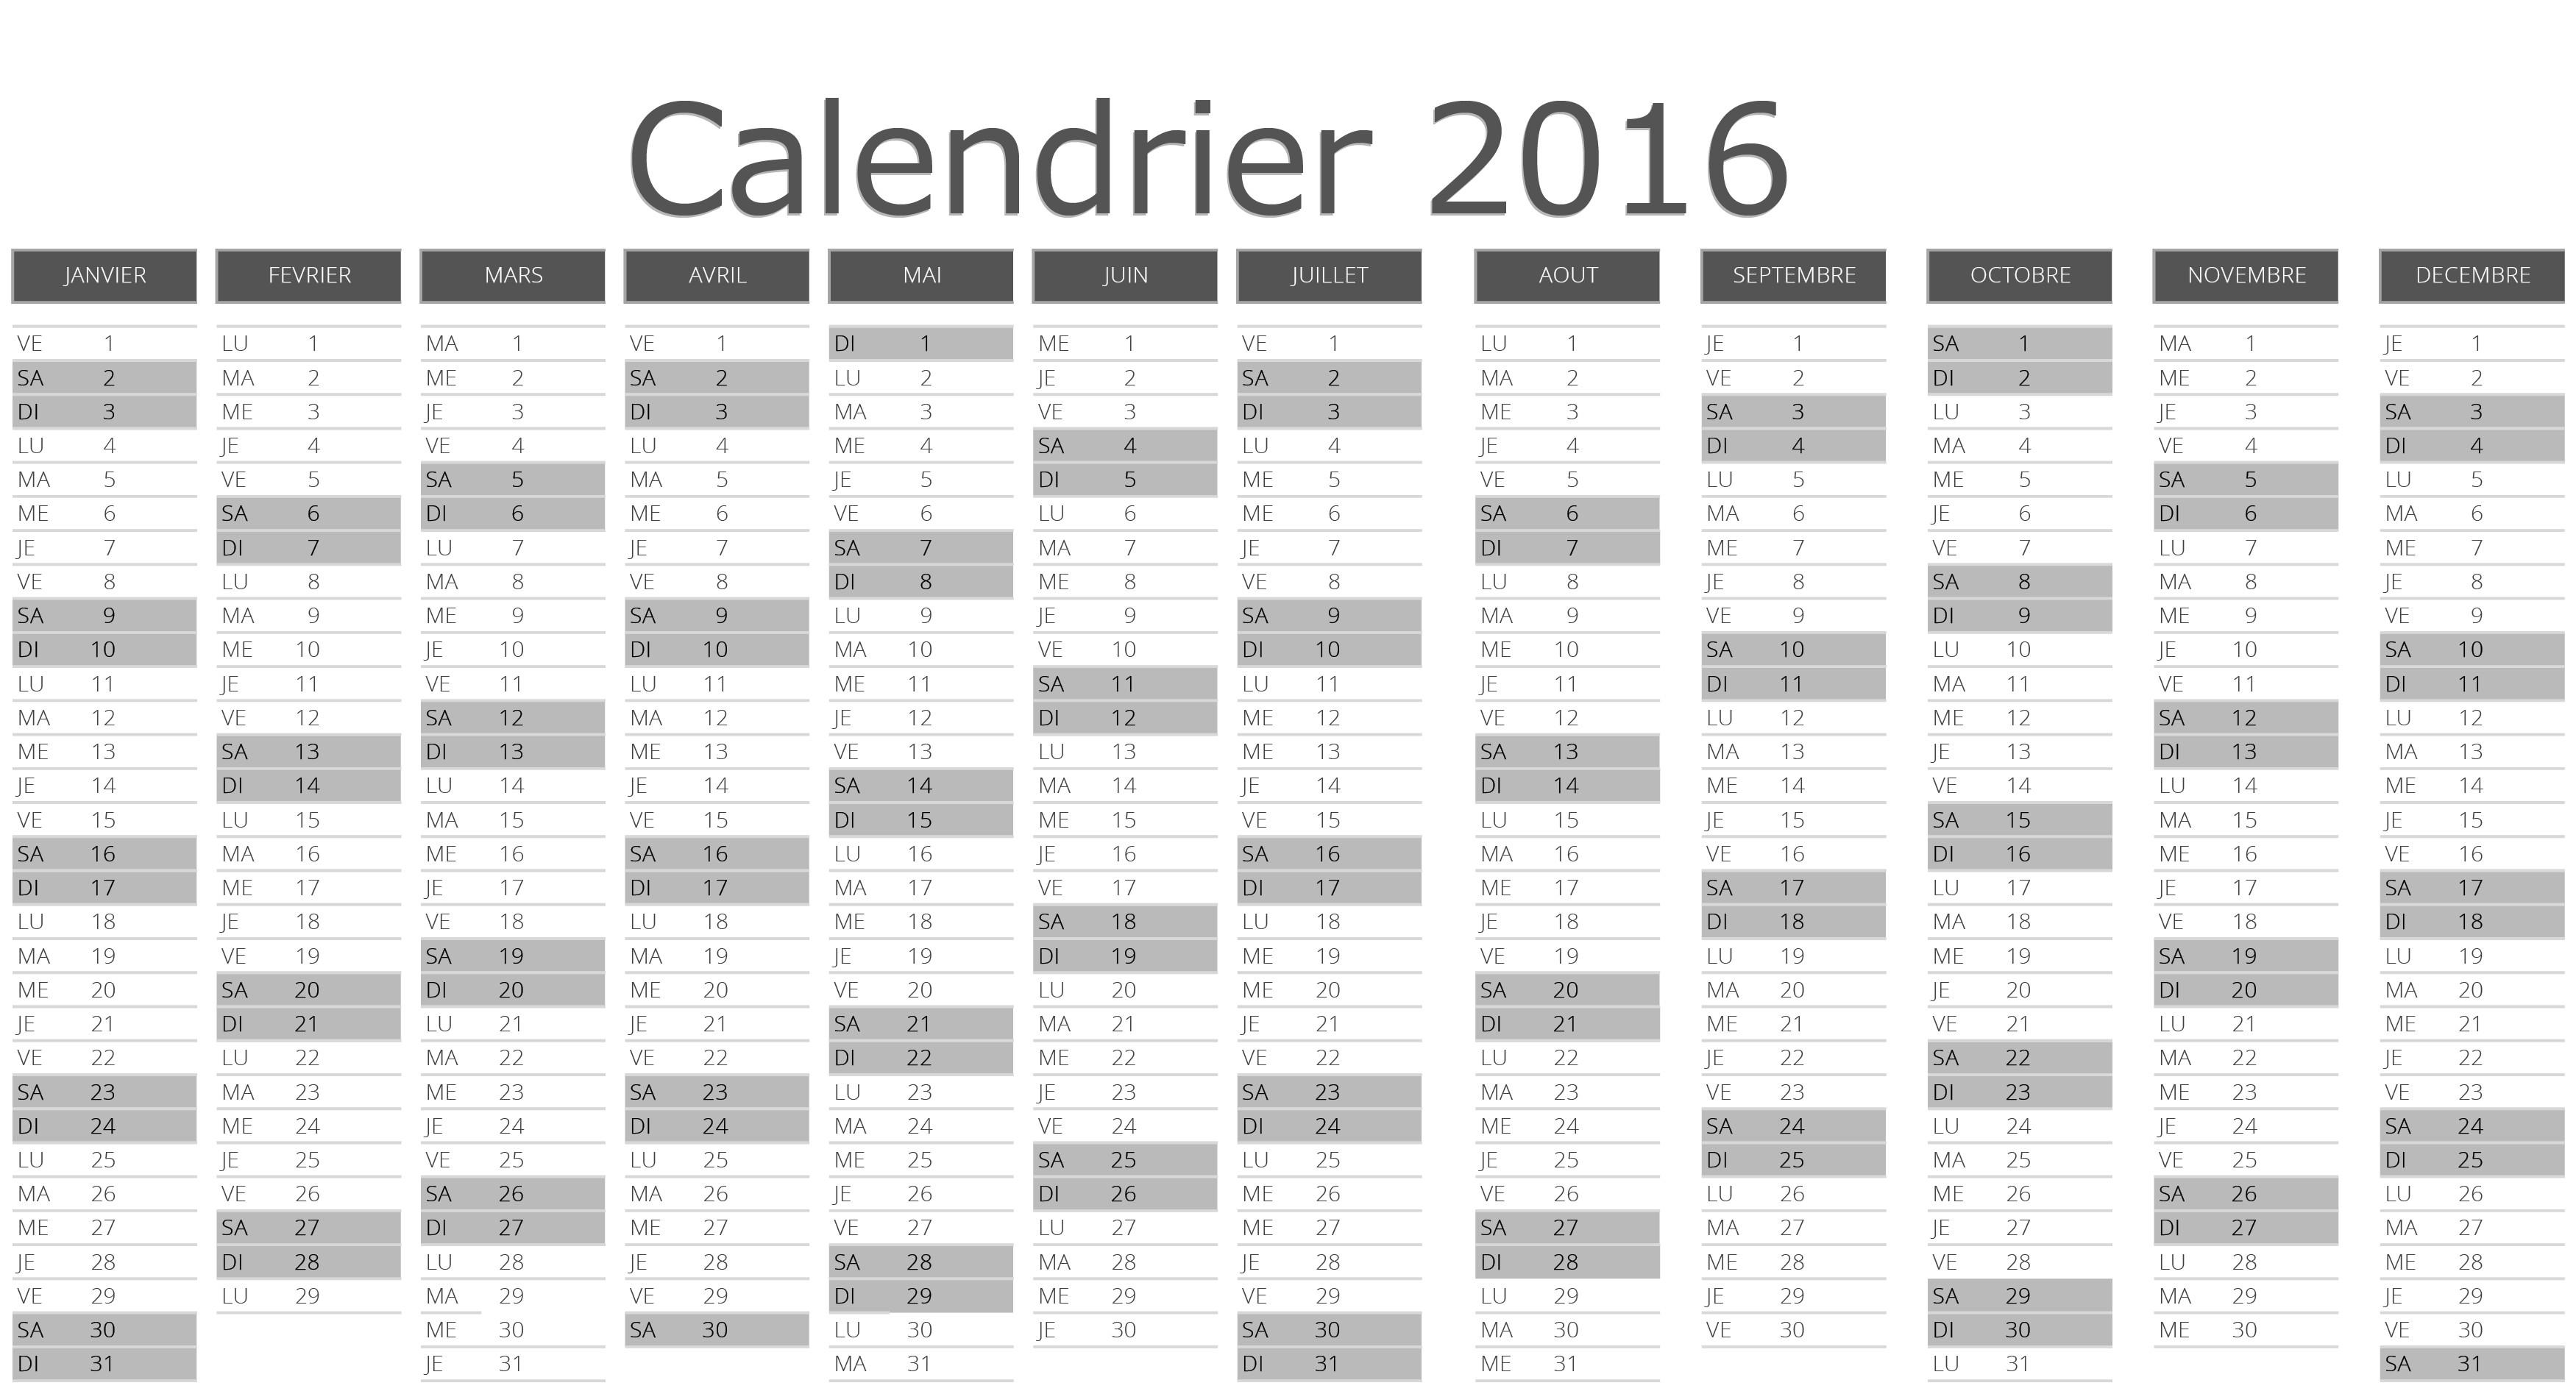 Calendario 2019 Chile Imprimir Con Feriados Más Populares 2019 2018 Calendar Printable with Holidays List Kalender Kalendar Of Calendario 2019 Chile Imprimir Con Feriados Más Recientes Calendario Noviembre 2018 Printables Pinterest